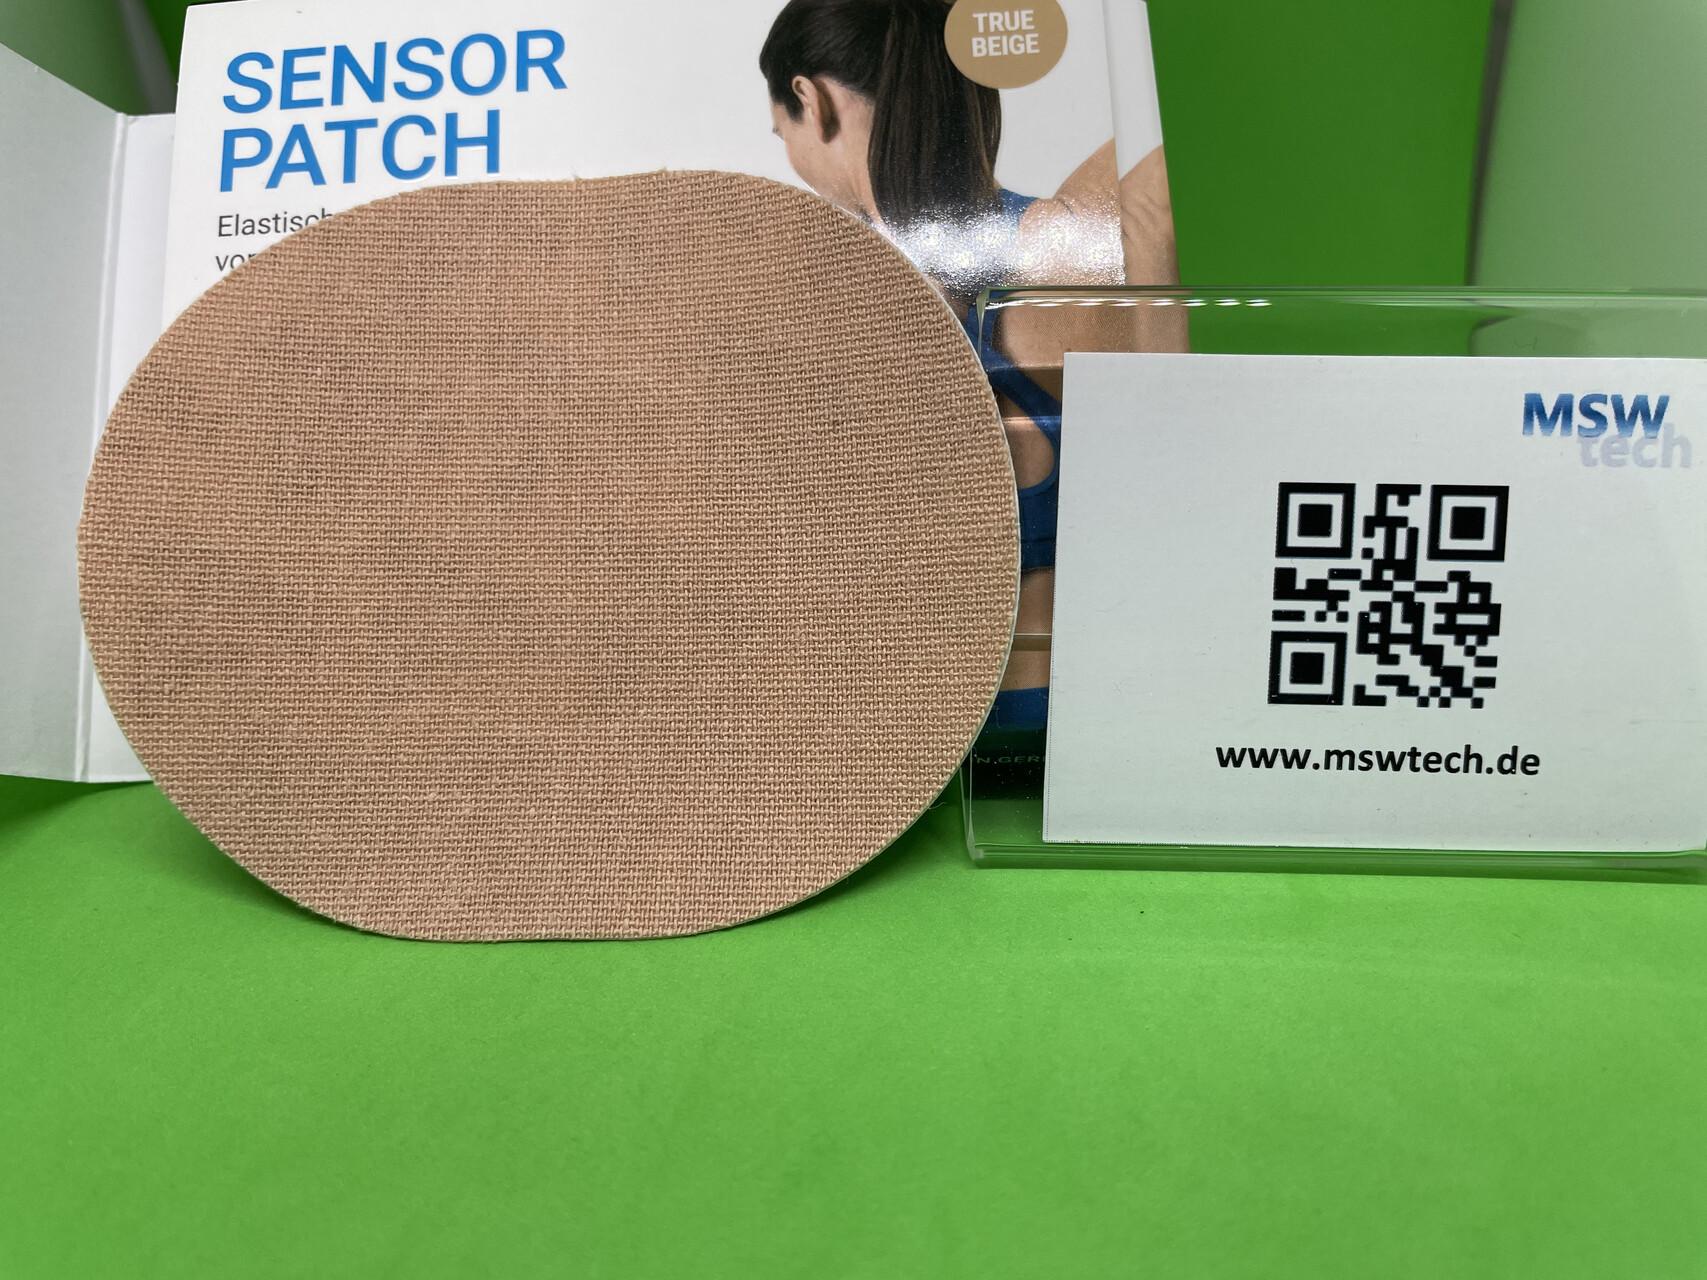 Sensor Patch